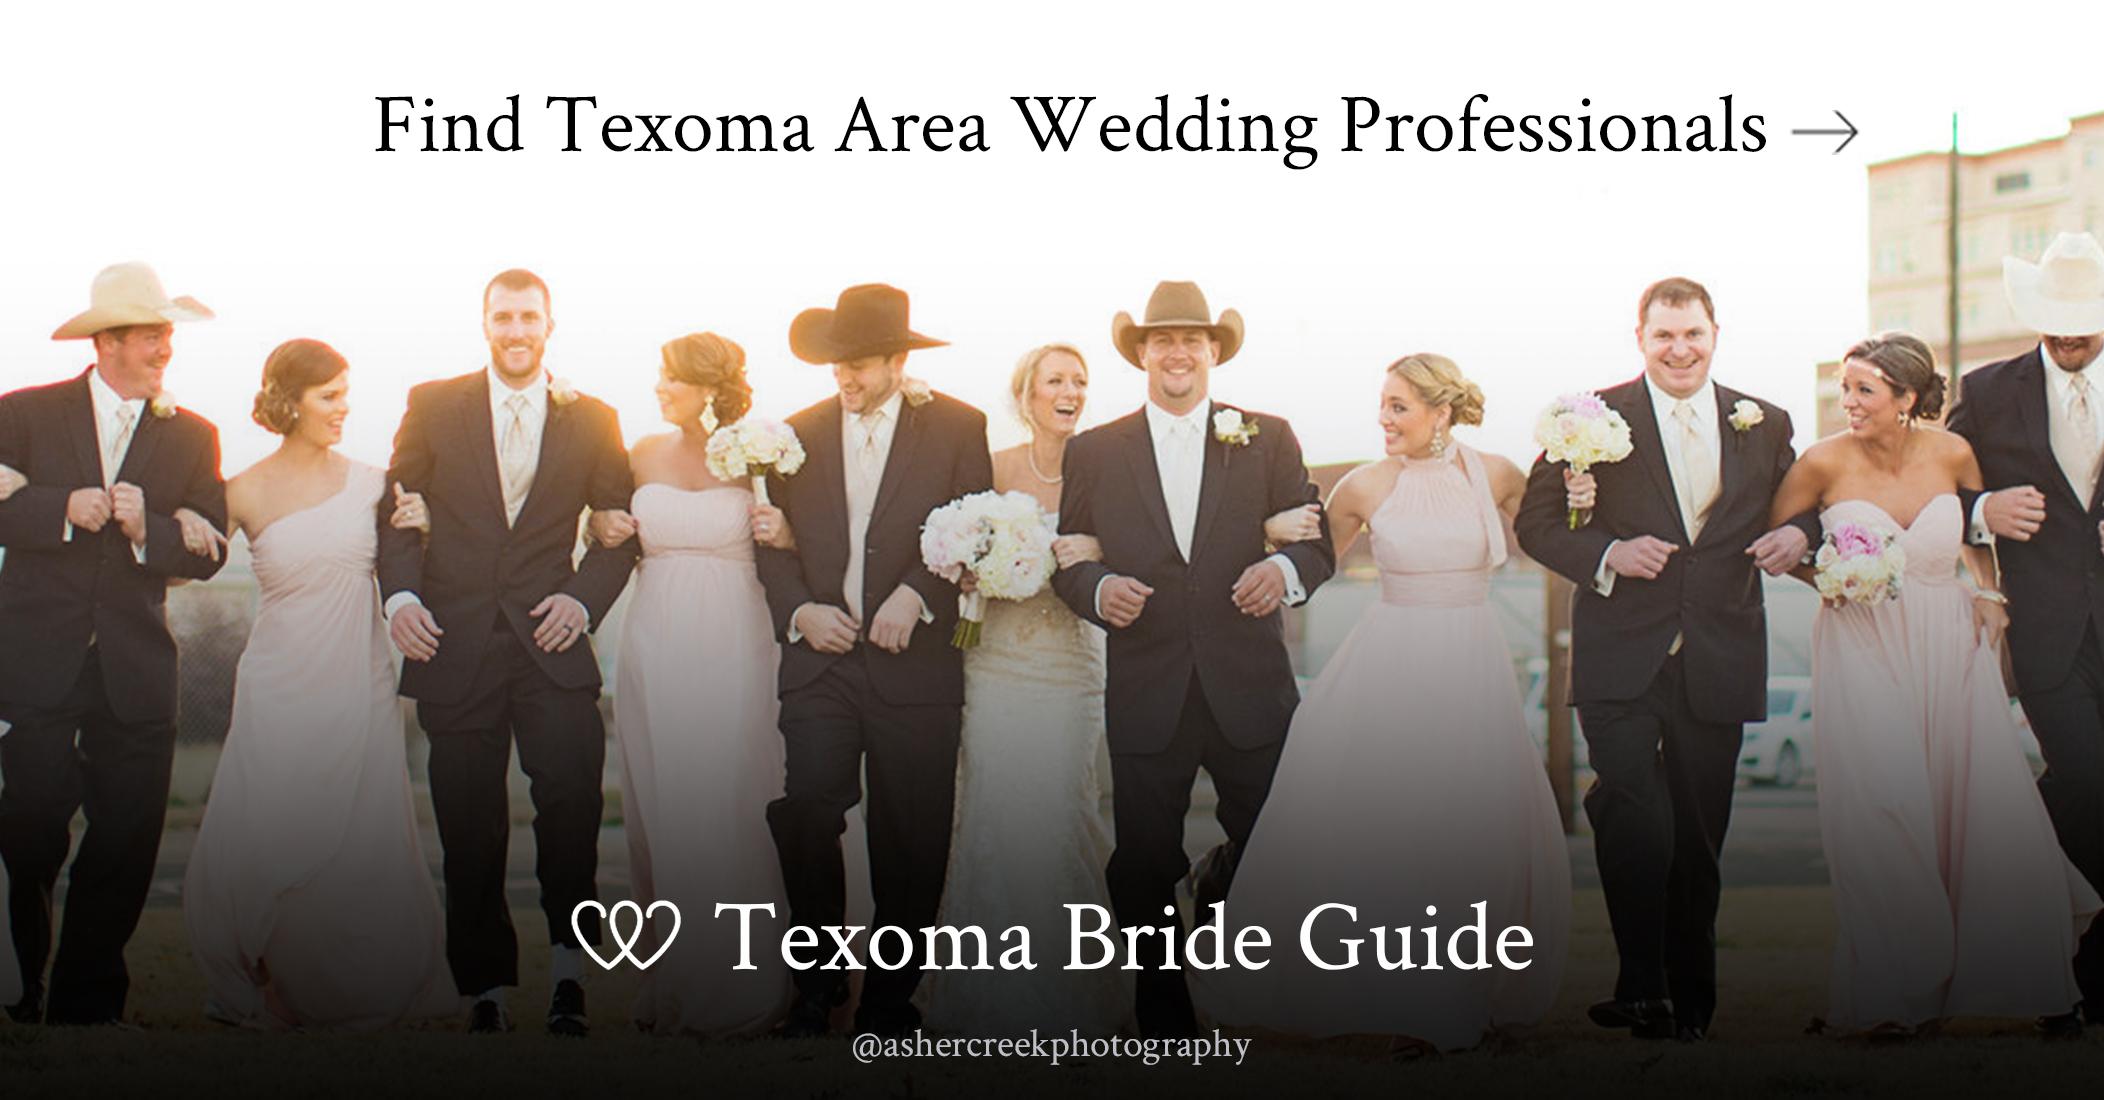 Wedding Photographers Advice